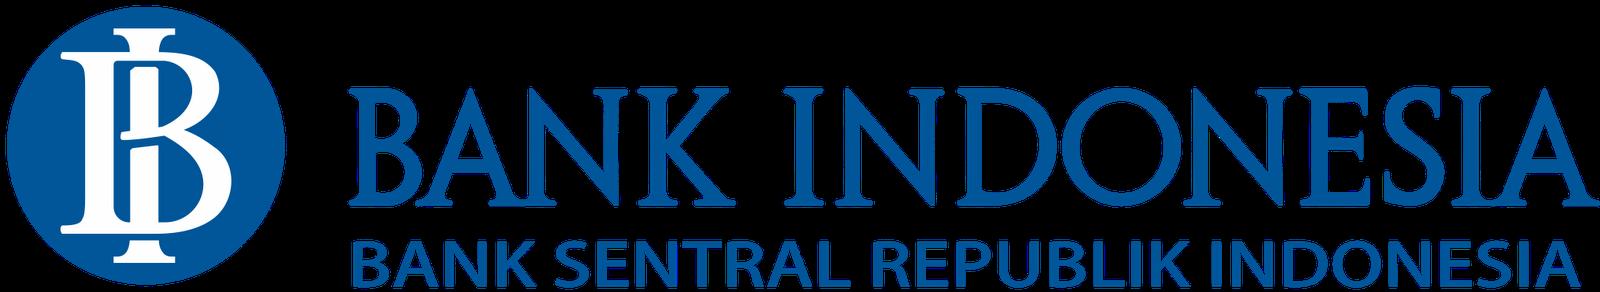 Logo-Bank-Indonesia-Kantor Pusat Bank Indonesia